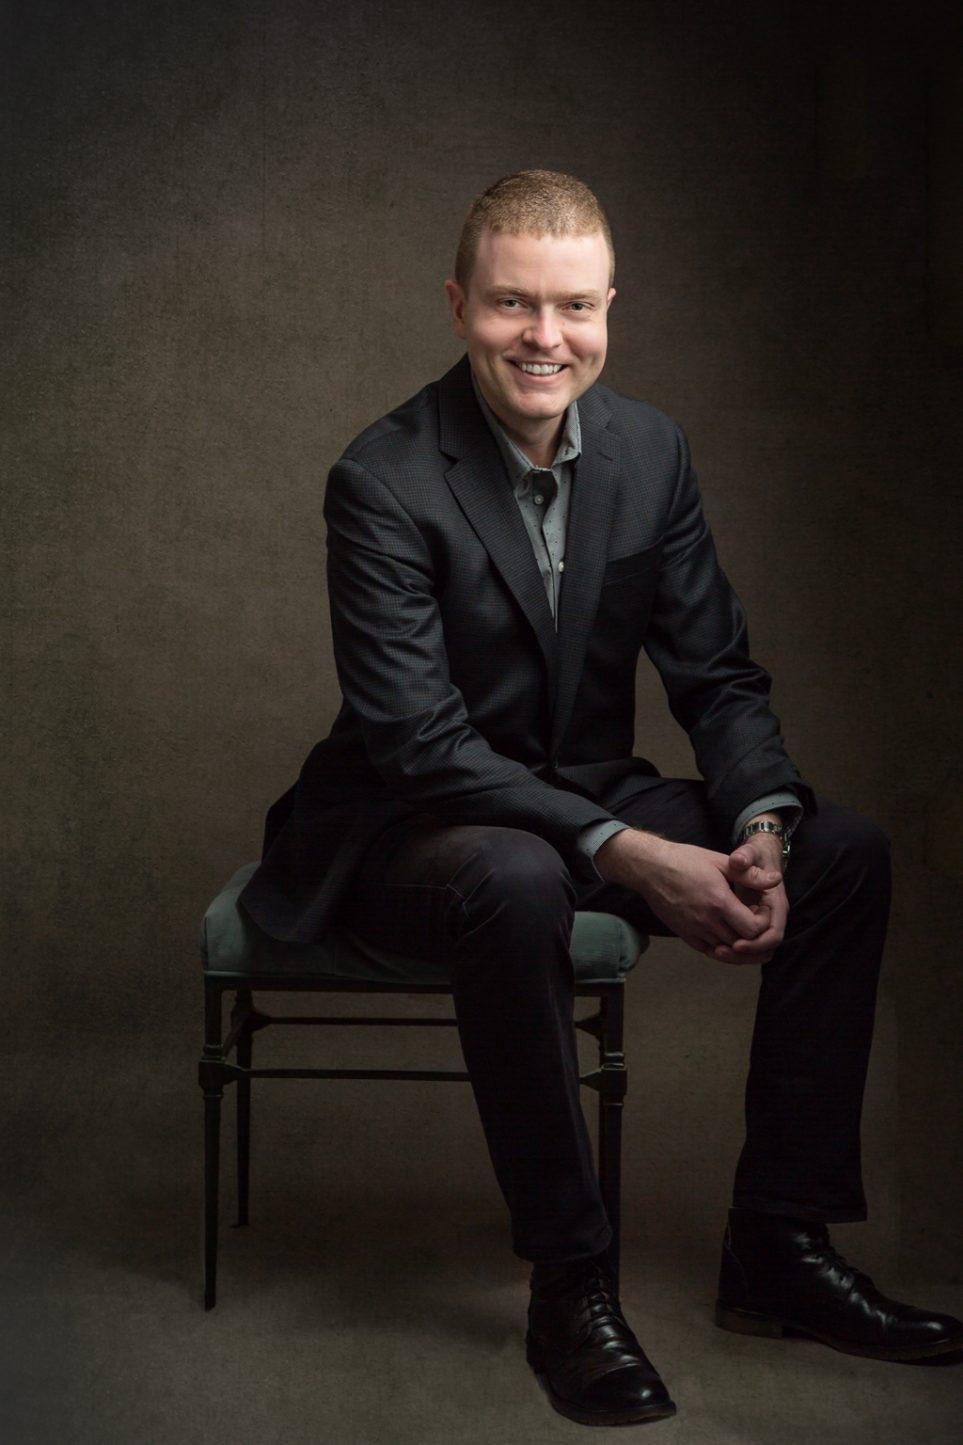 Male Portrait Digital Background Sitting